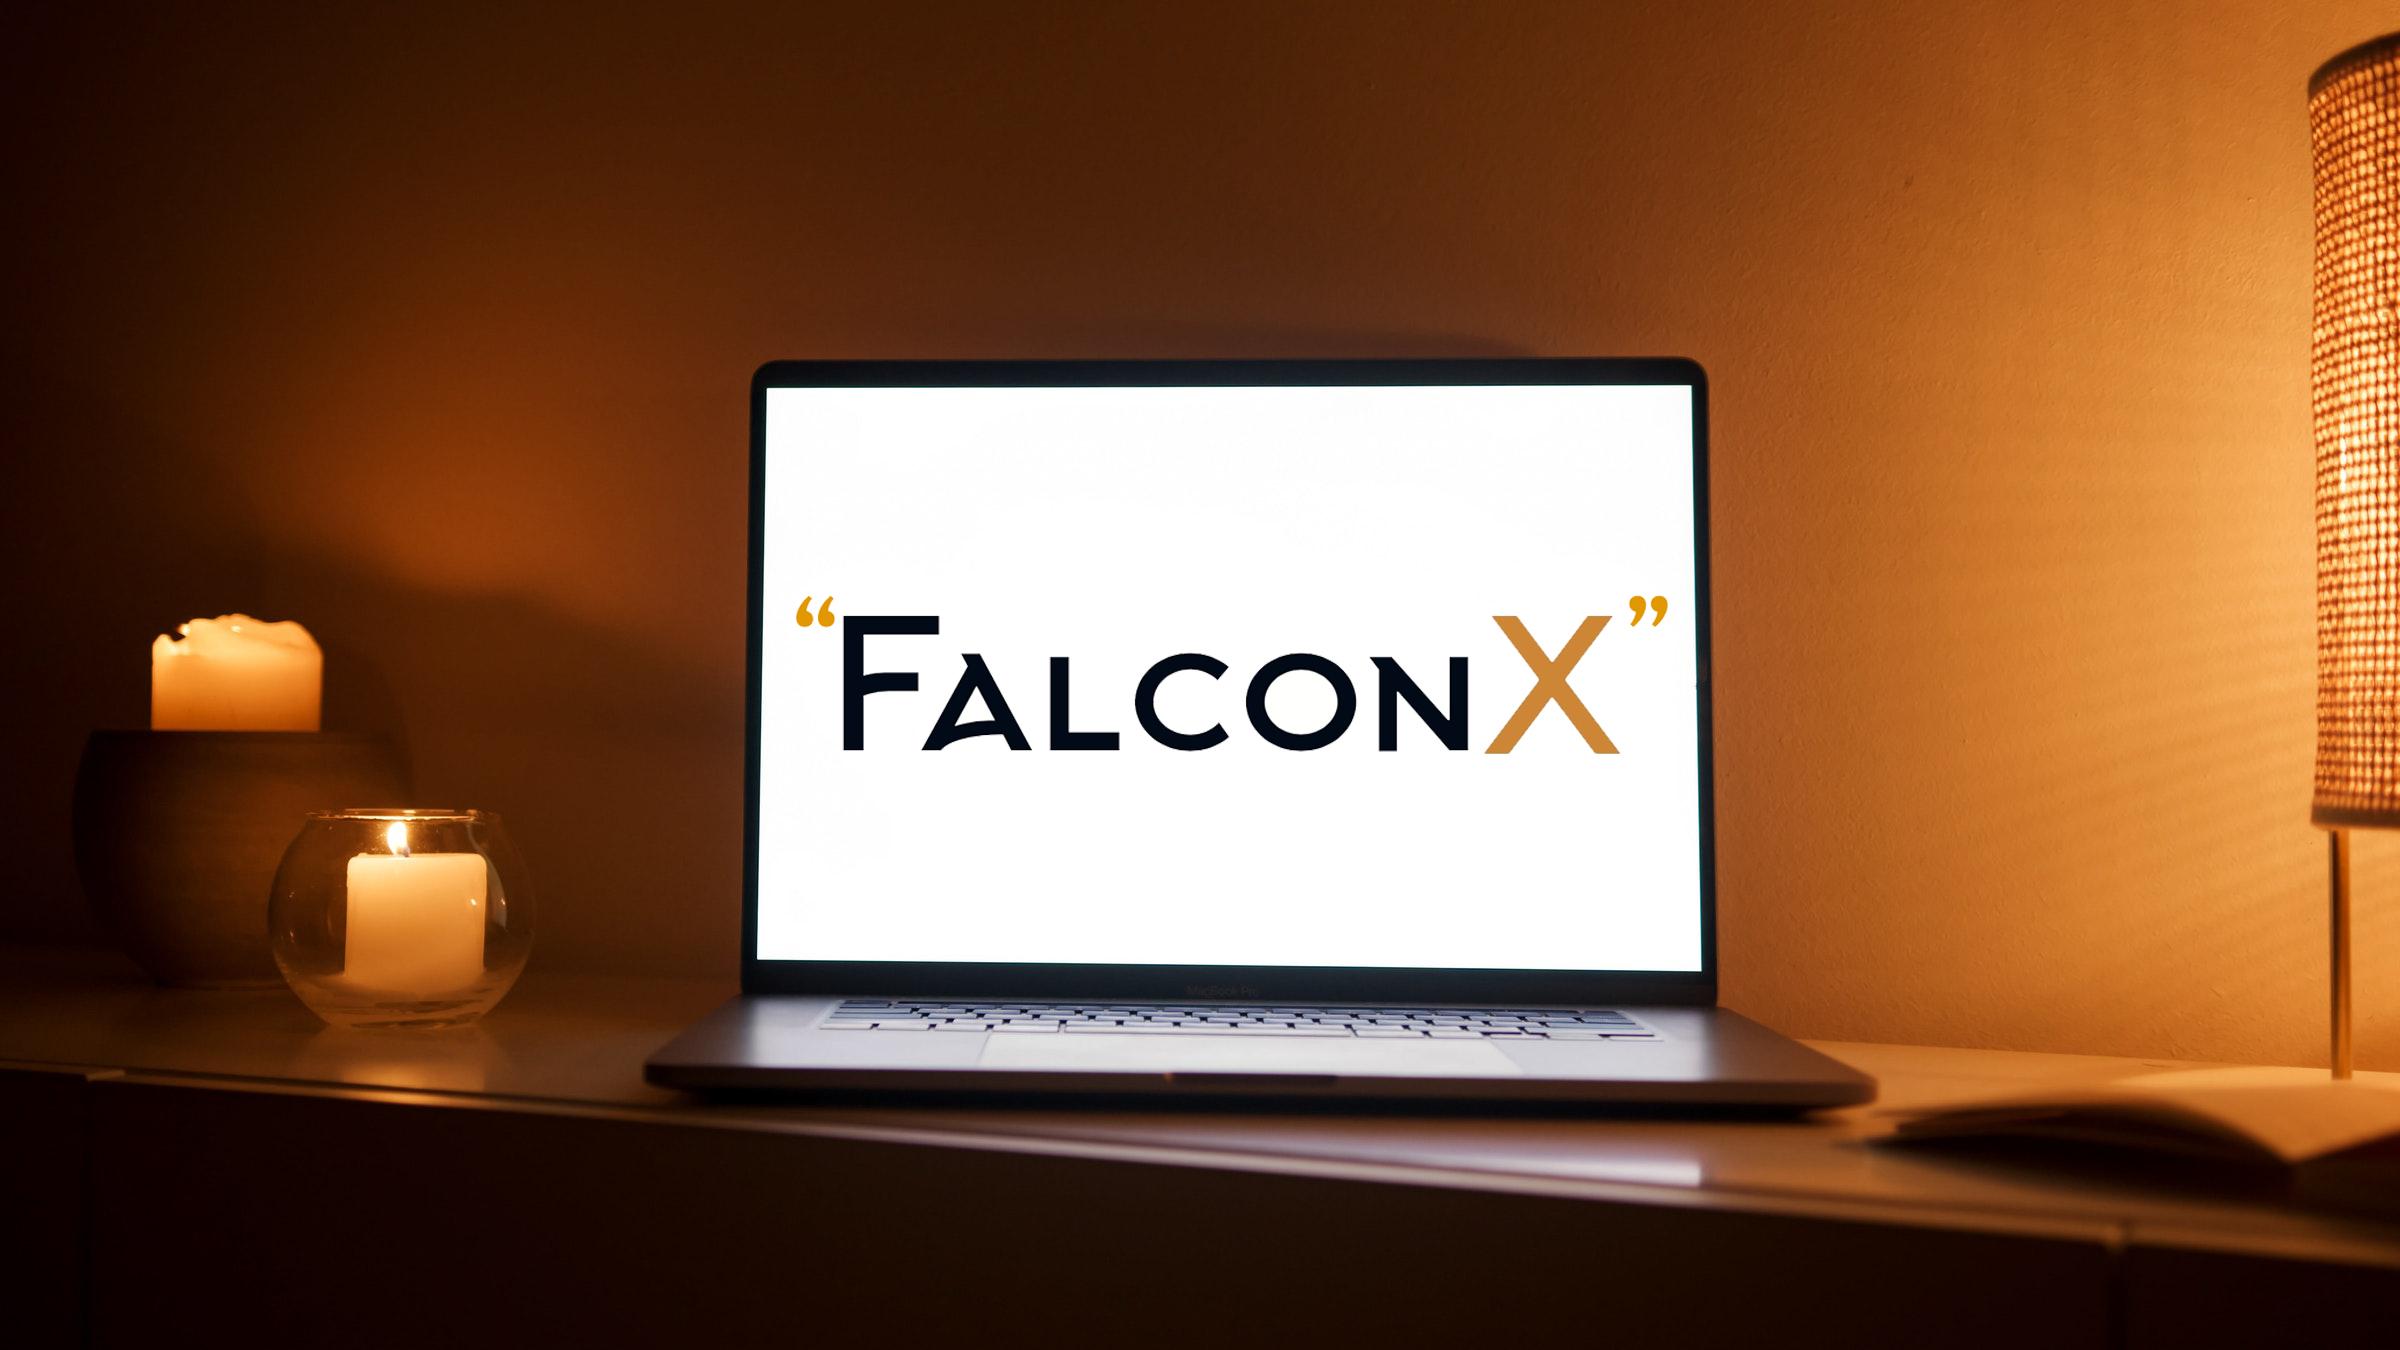 Crypto Platform FalconX logo on Laptop with nice ambiance